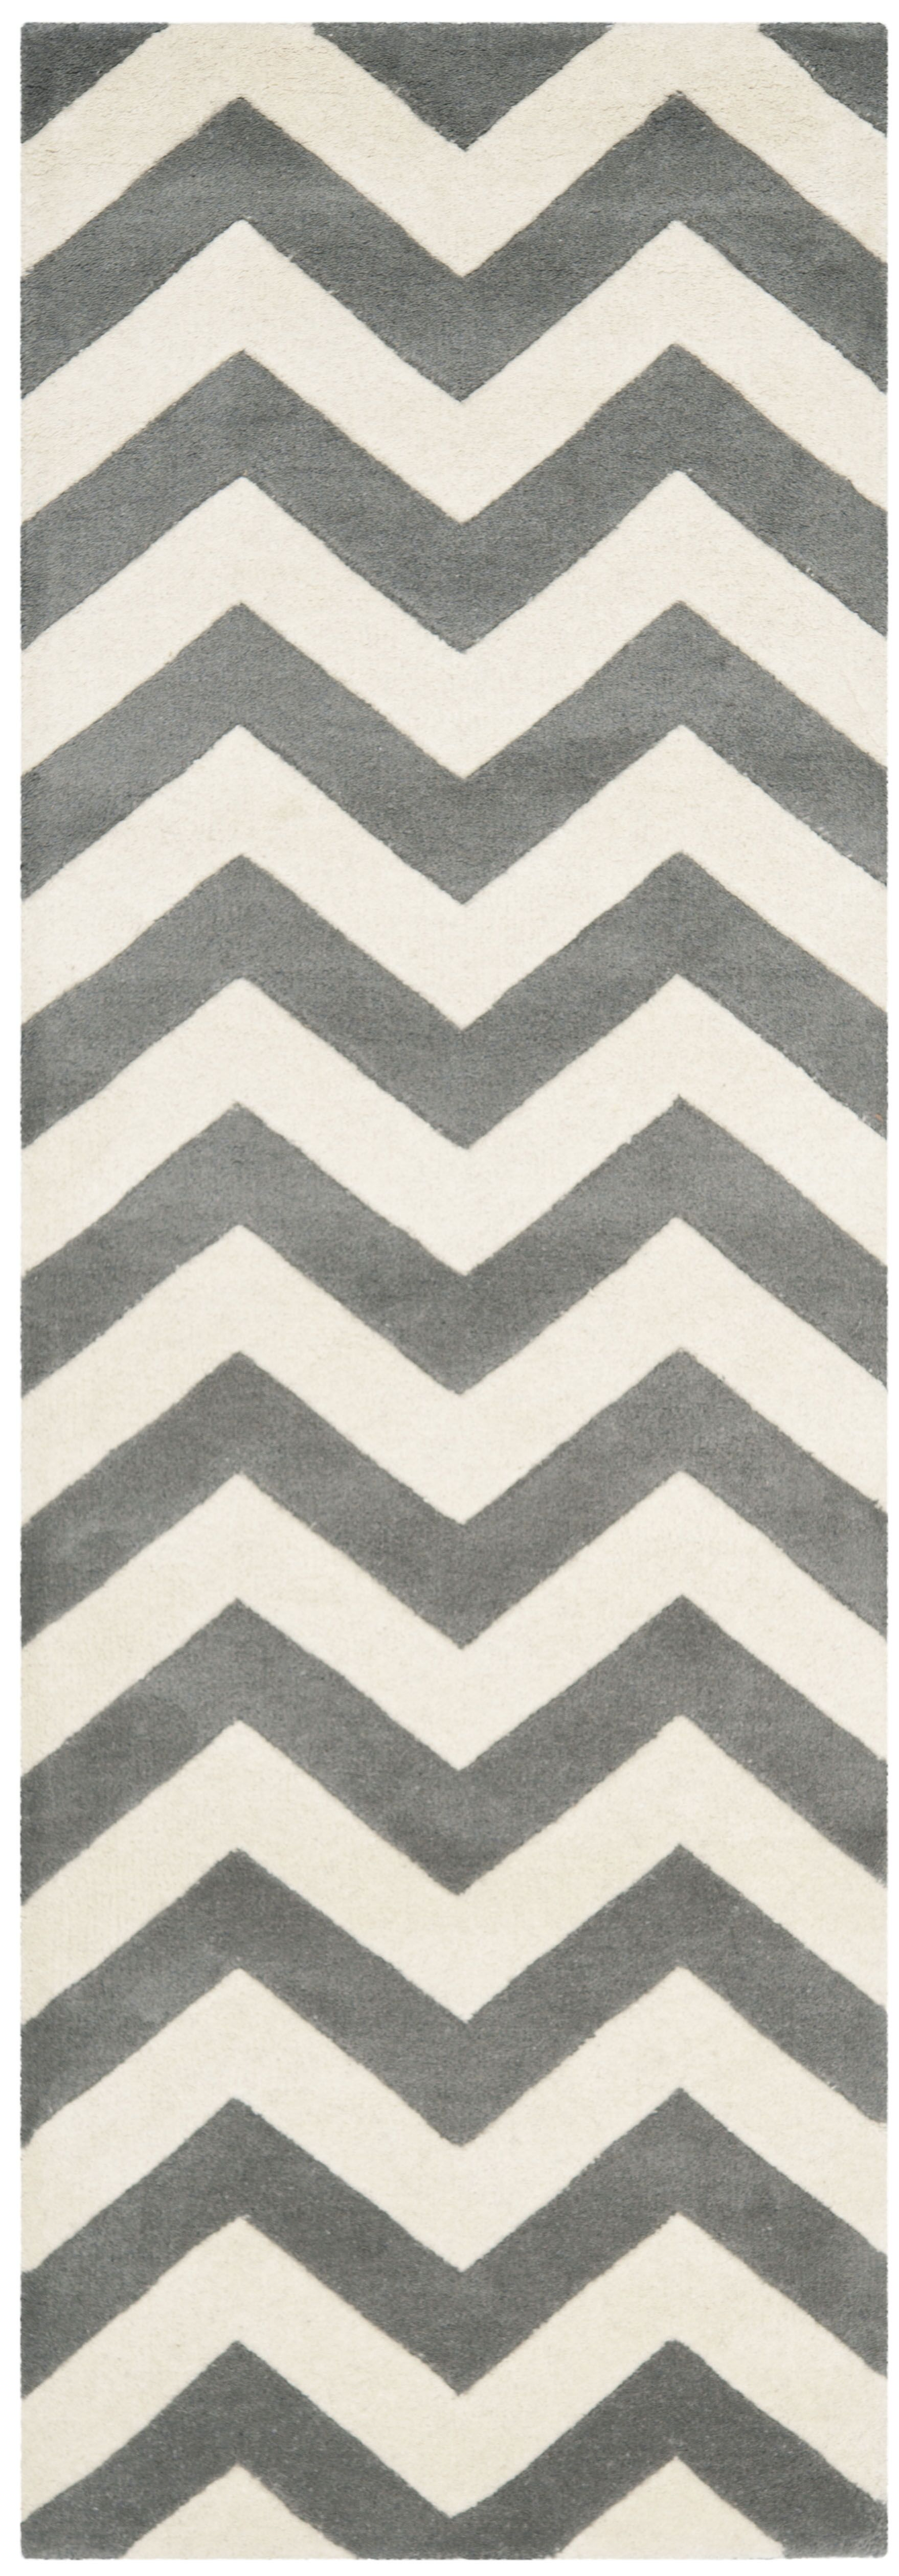 Wilkin Hand-Tufted Wool Dark Gray/Ivory Chevron Area Rug Rug Size: Runner 2'3